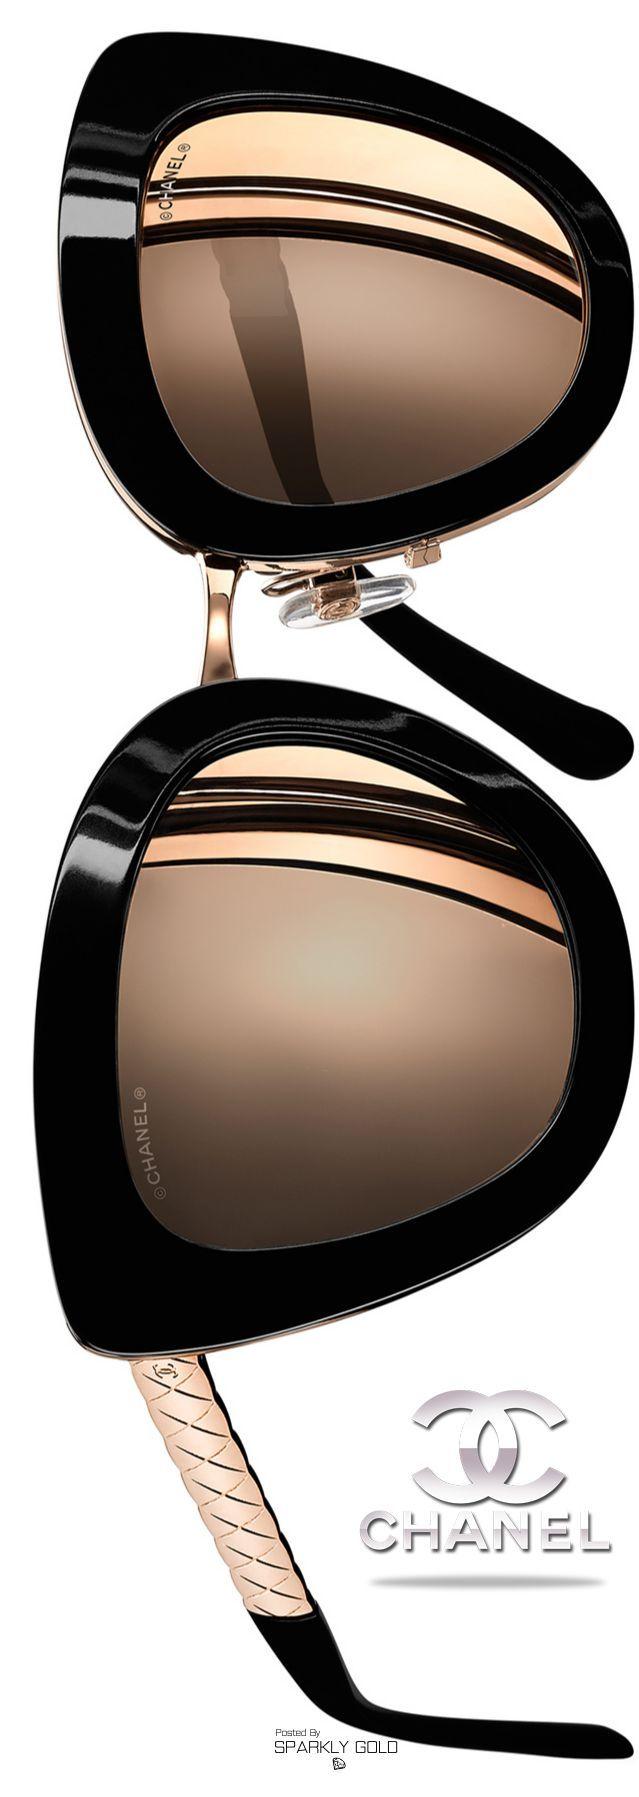 949 best EYEWEAR images on Pinterest   Sunglasses, Eye glasses and ...